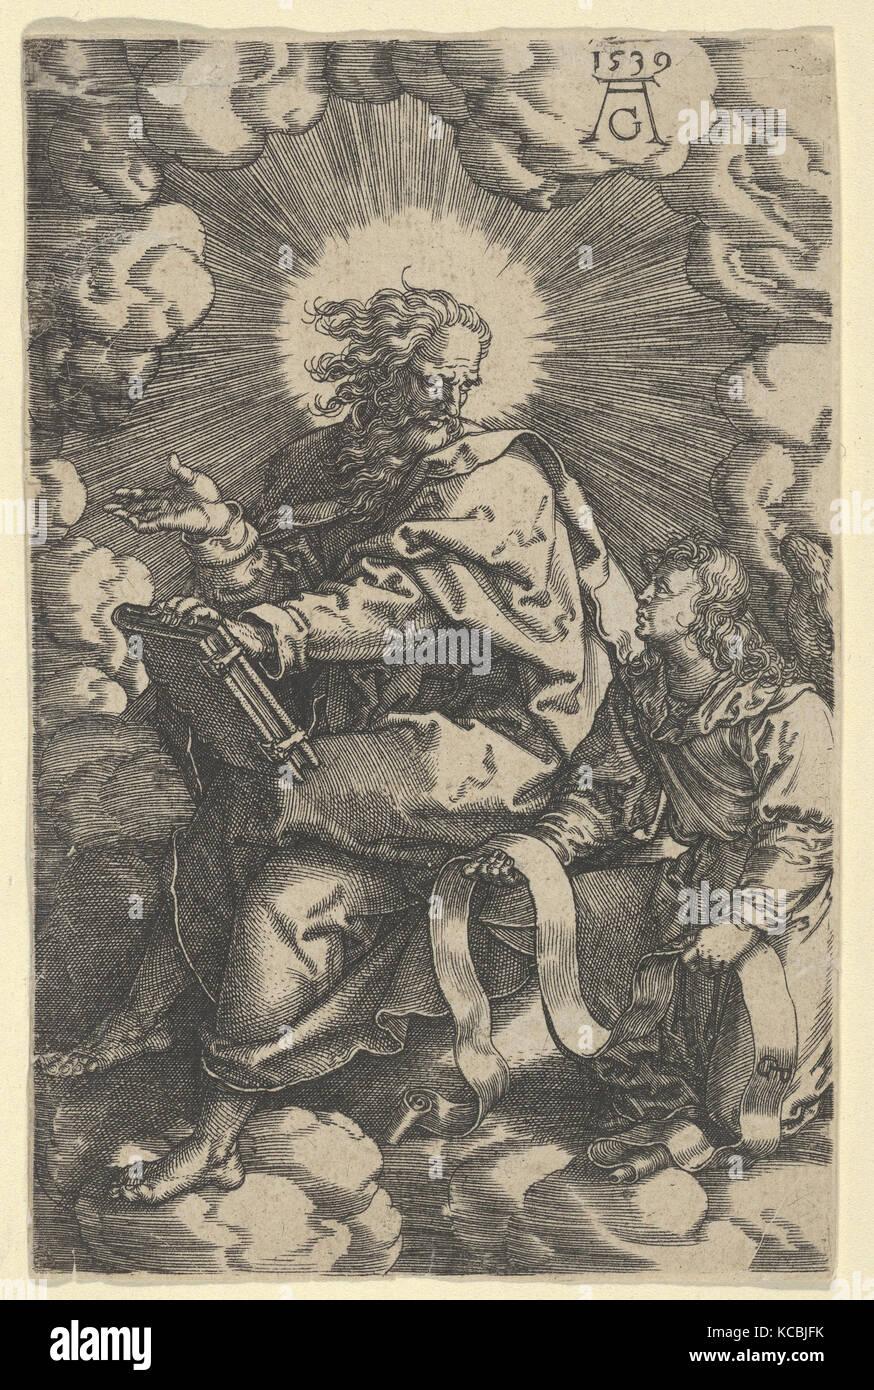 Saint Matthew, from The Four Evangelists, Heinrich Aldegrever, 1539 - Stock Image